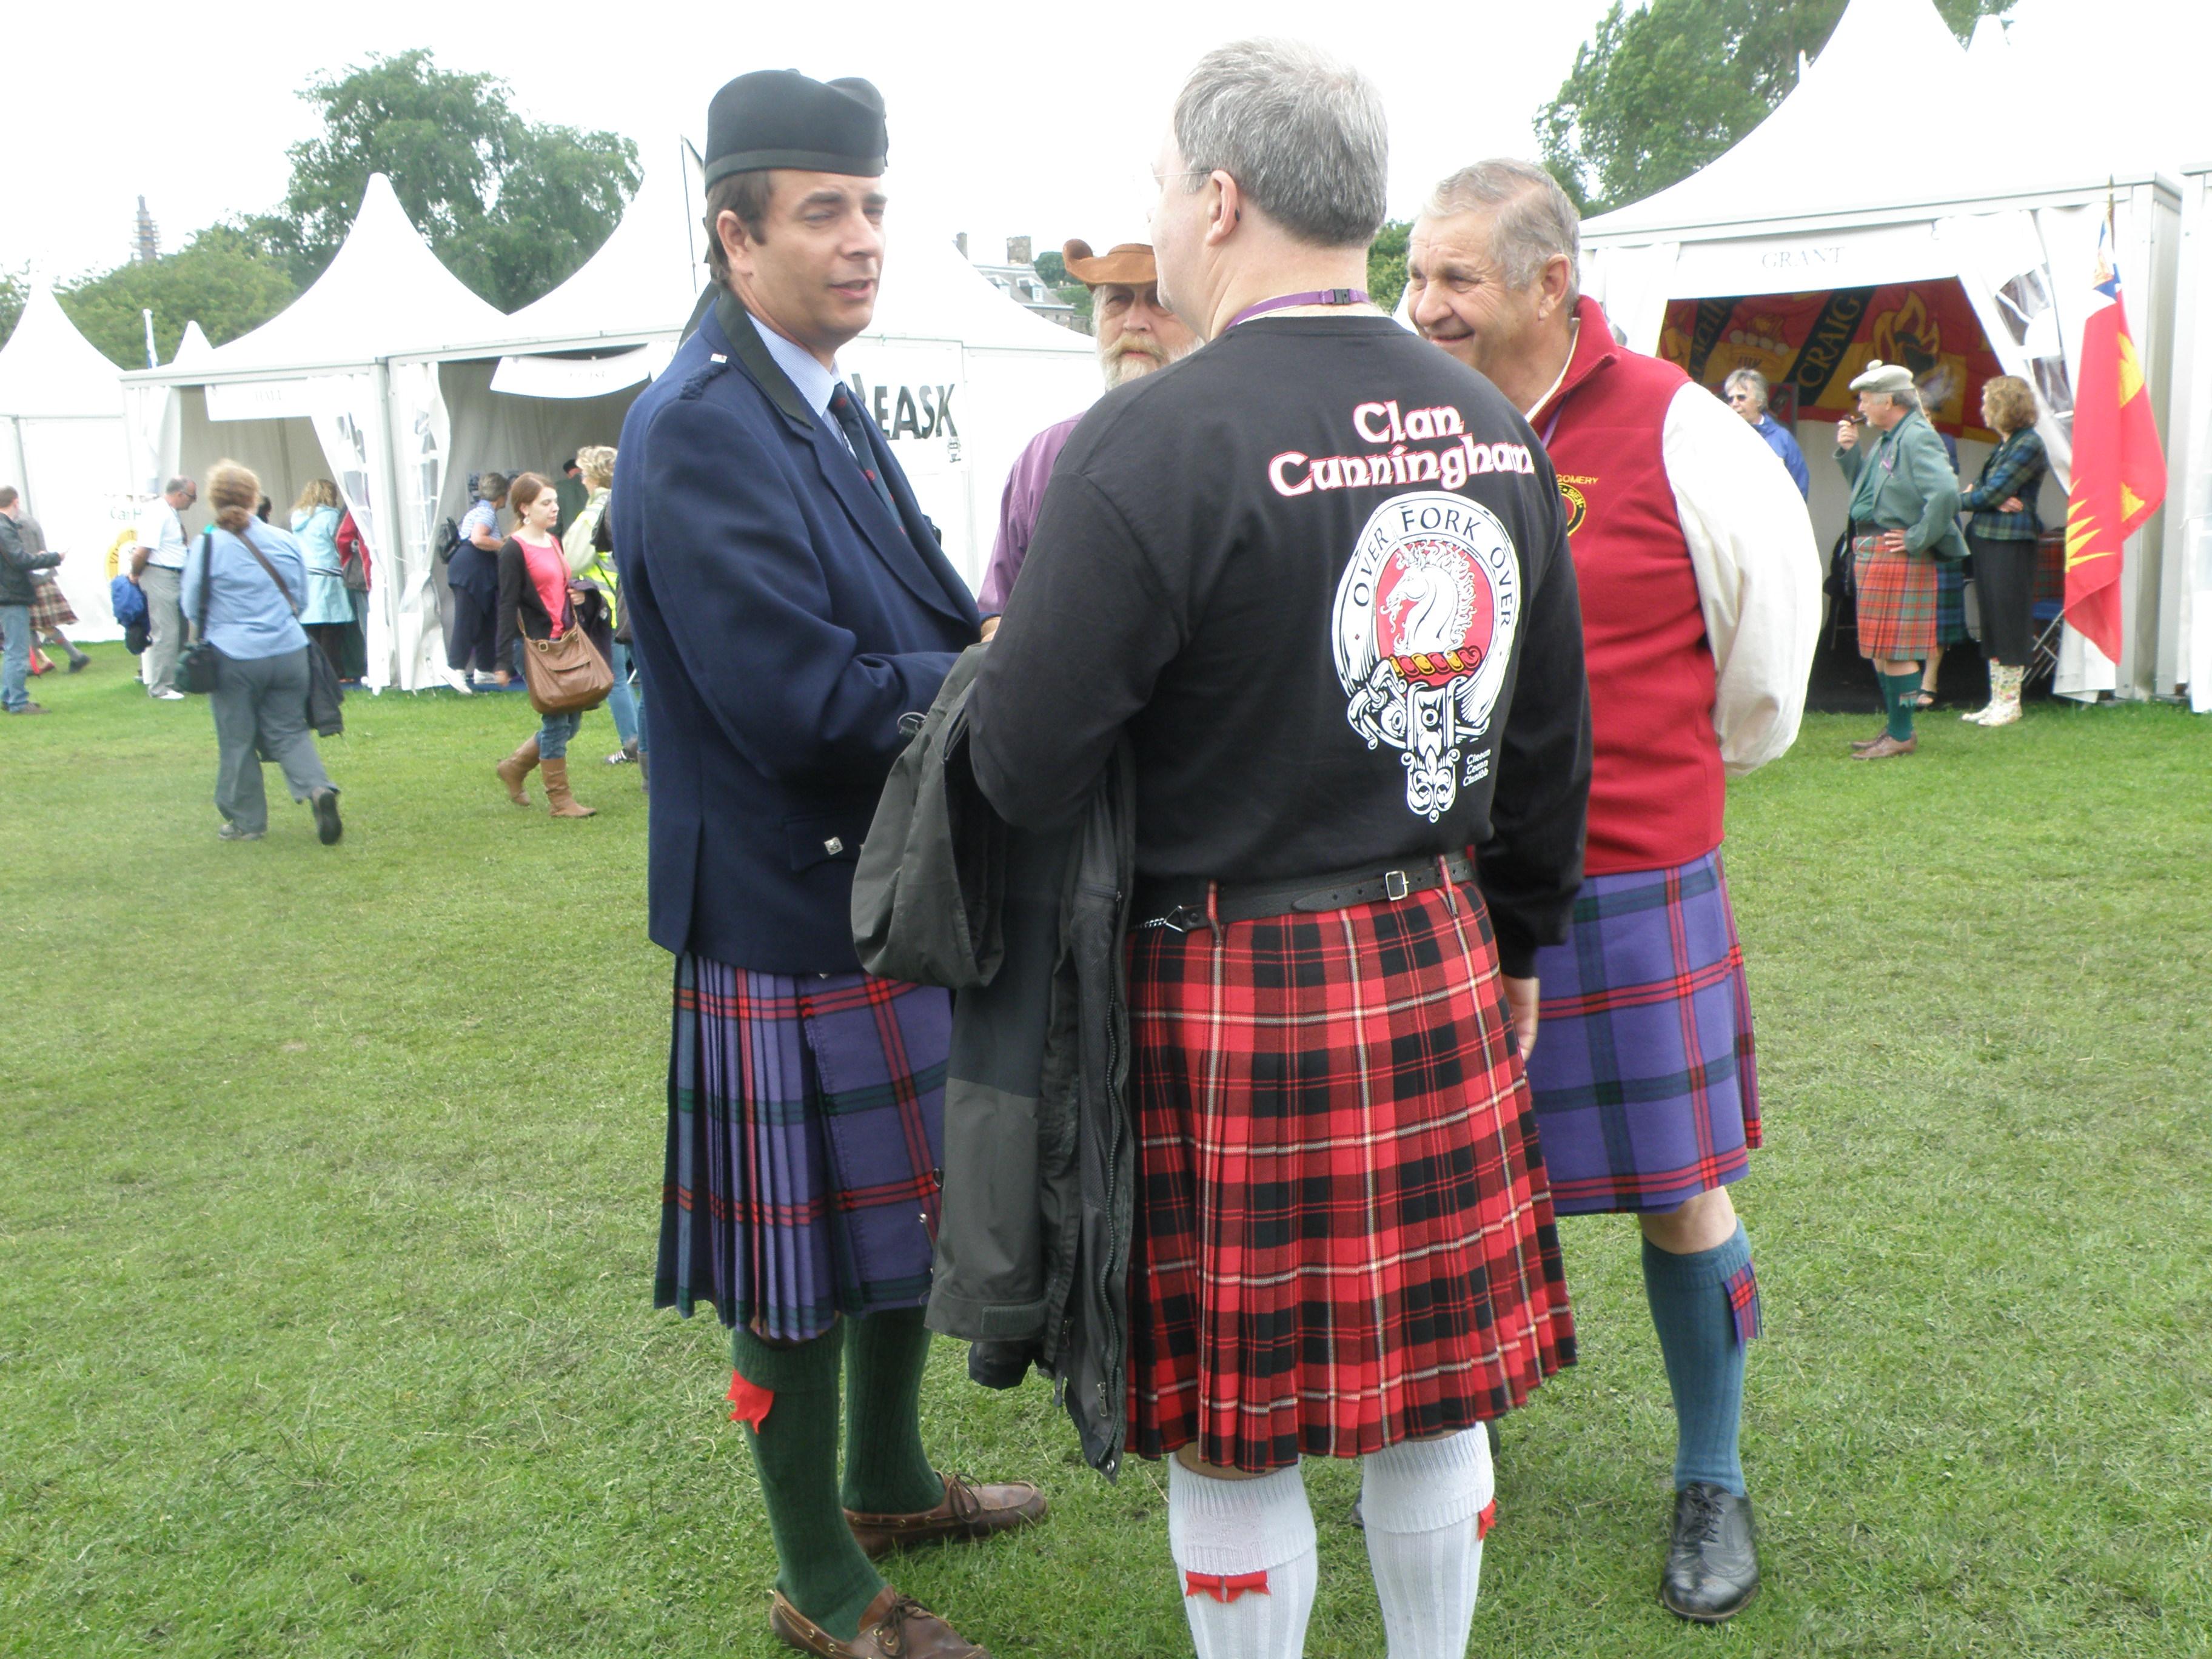 clan montgomery scotclans scottish clans